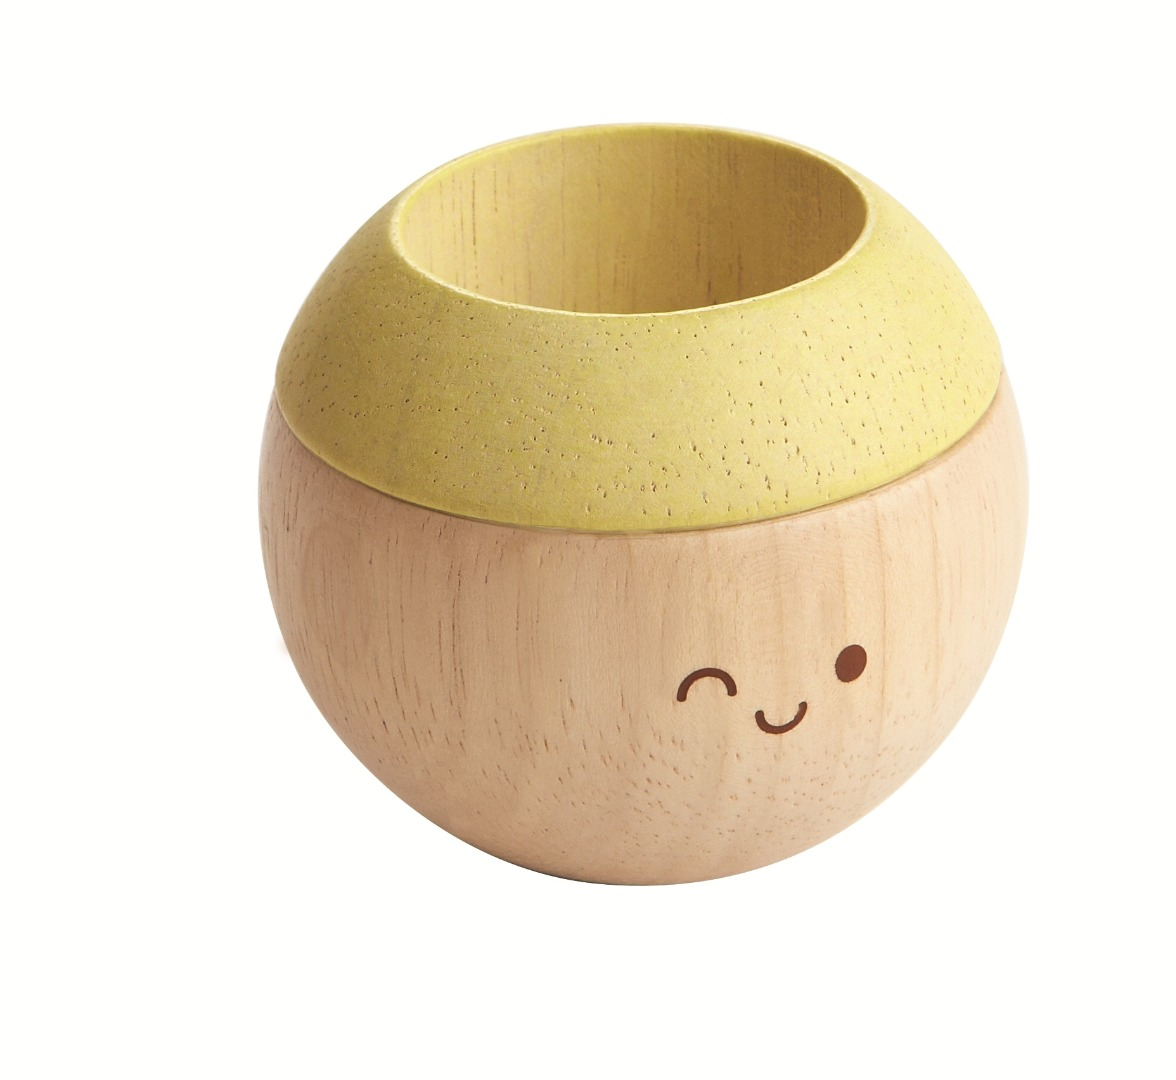 PlanToys Fühlspass Sensorig Spielzeug 6